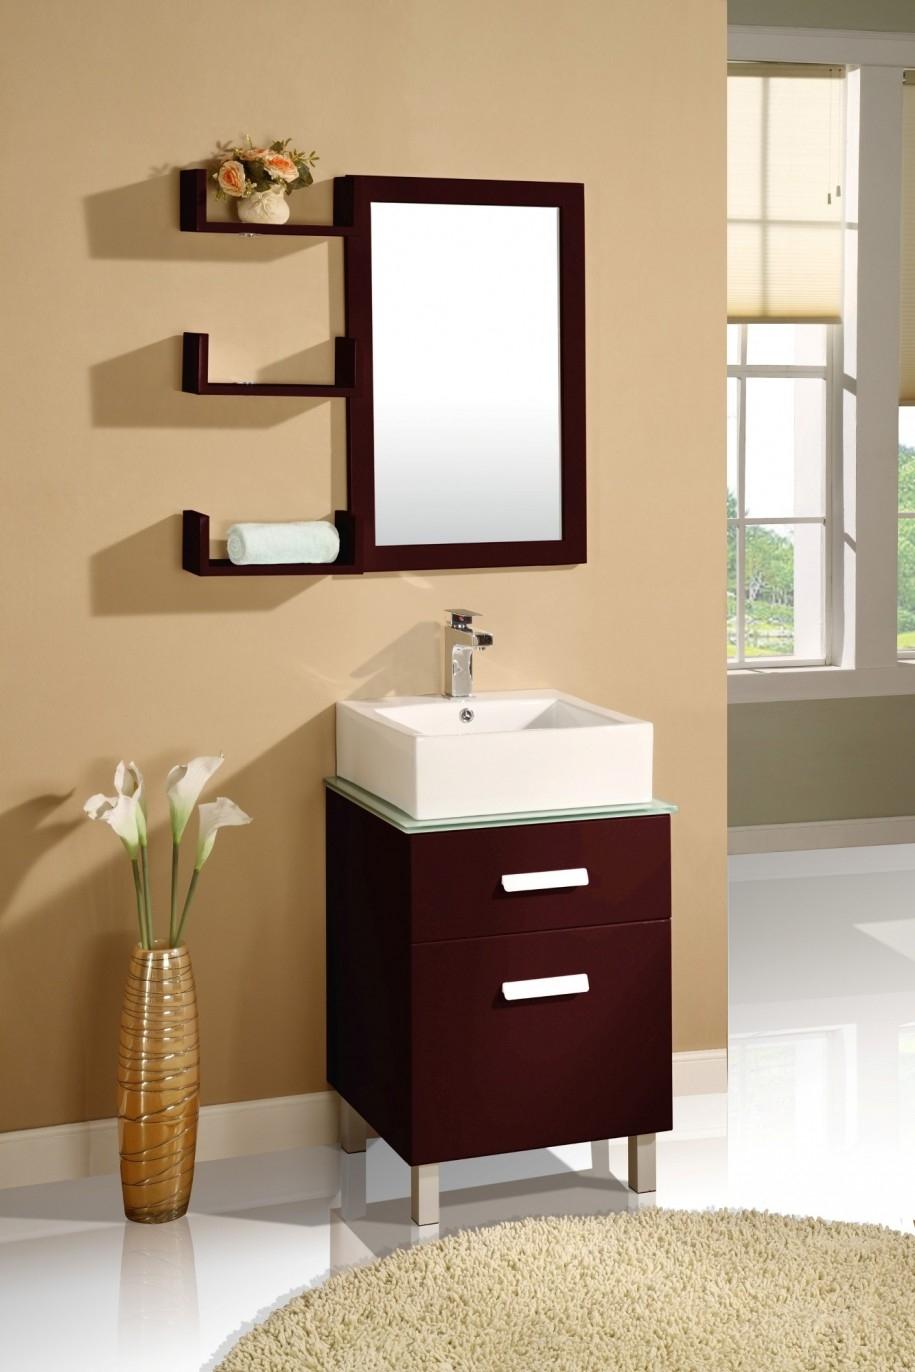 Bathroom Vanity Mirrors With Shelves